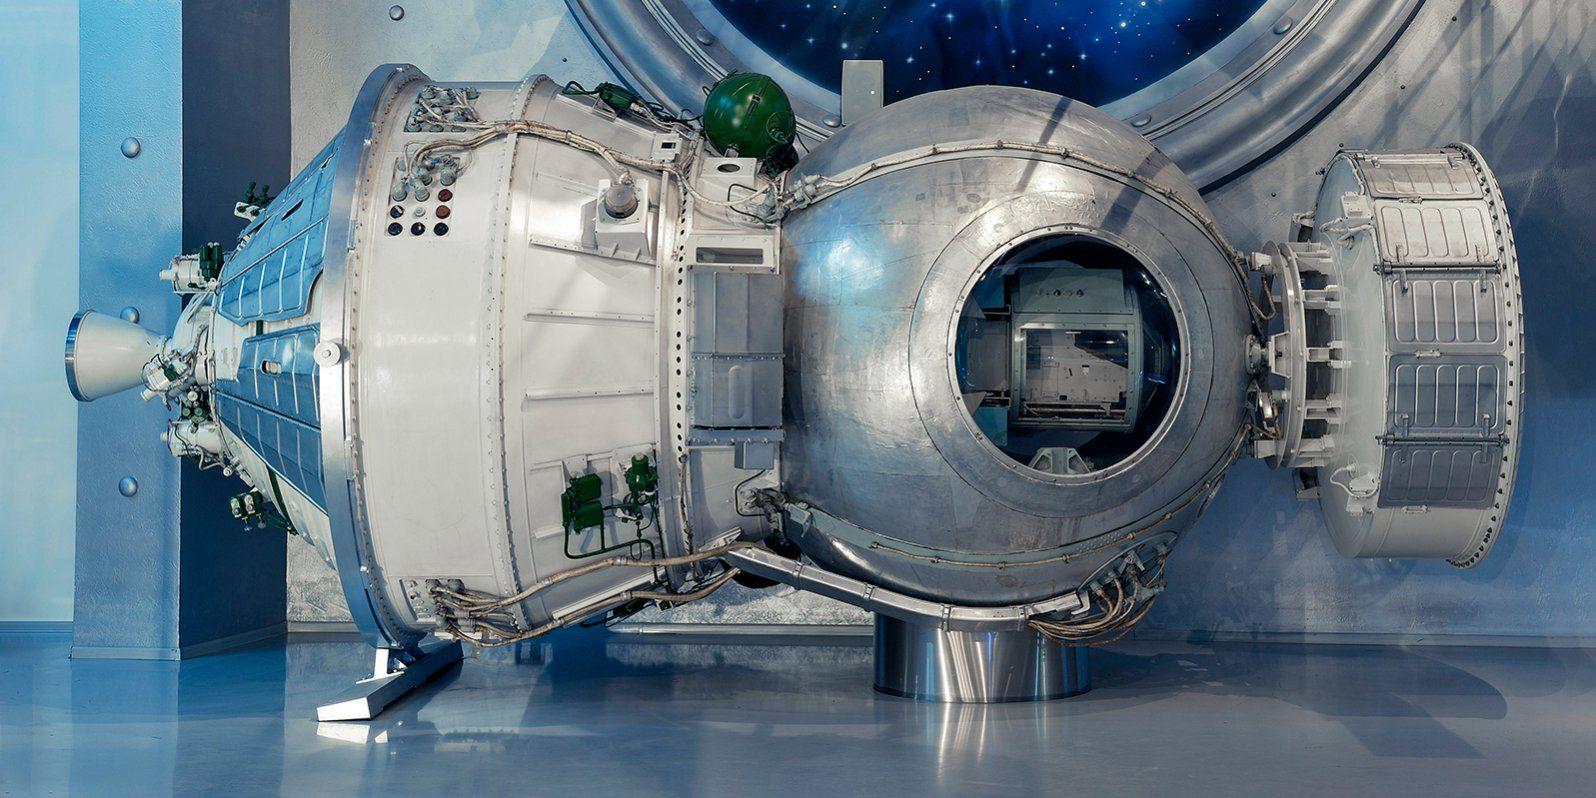 Онлайн-выставка «Космический дизайн» фото 1